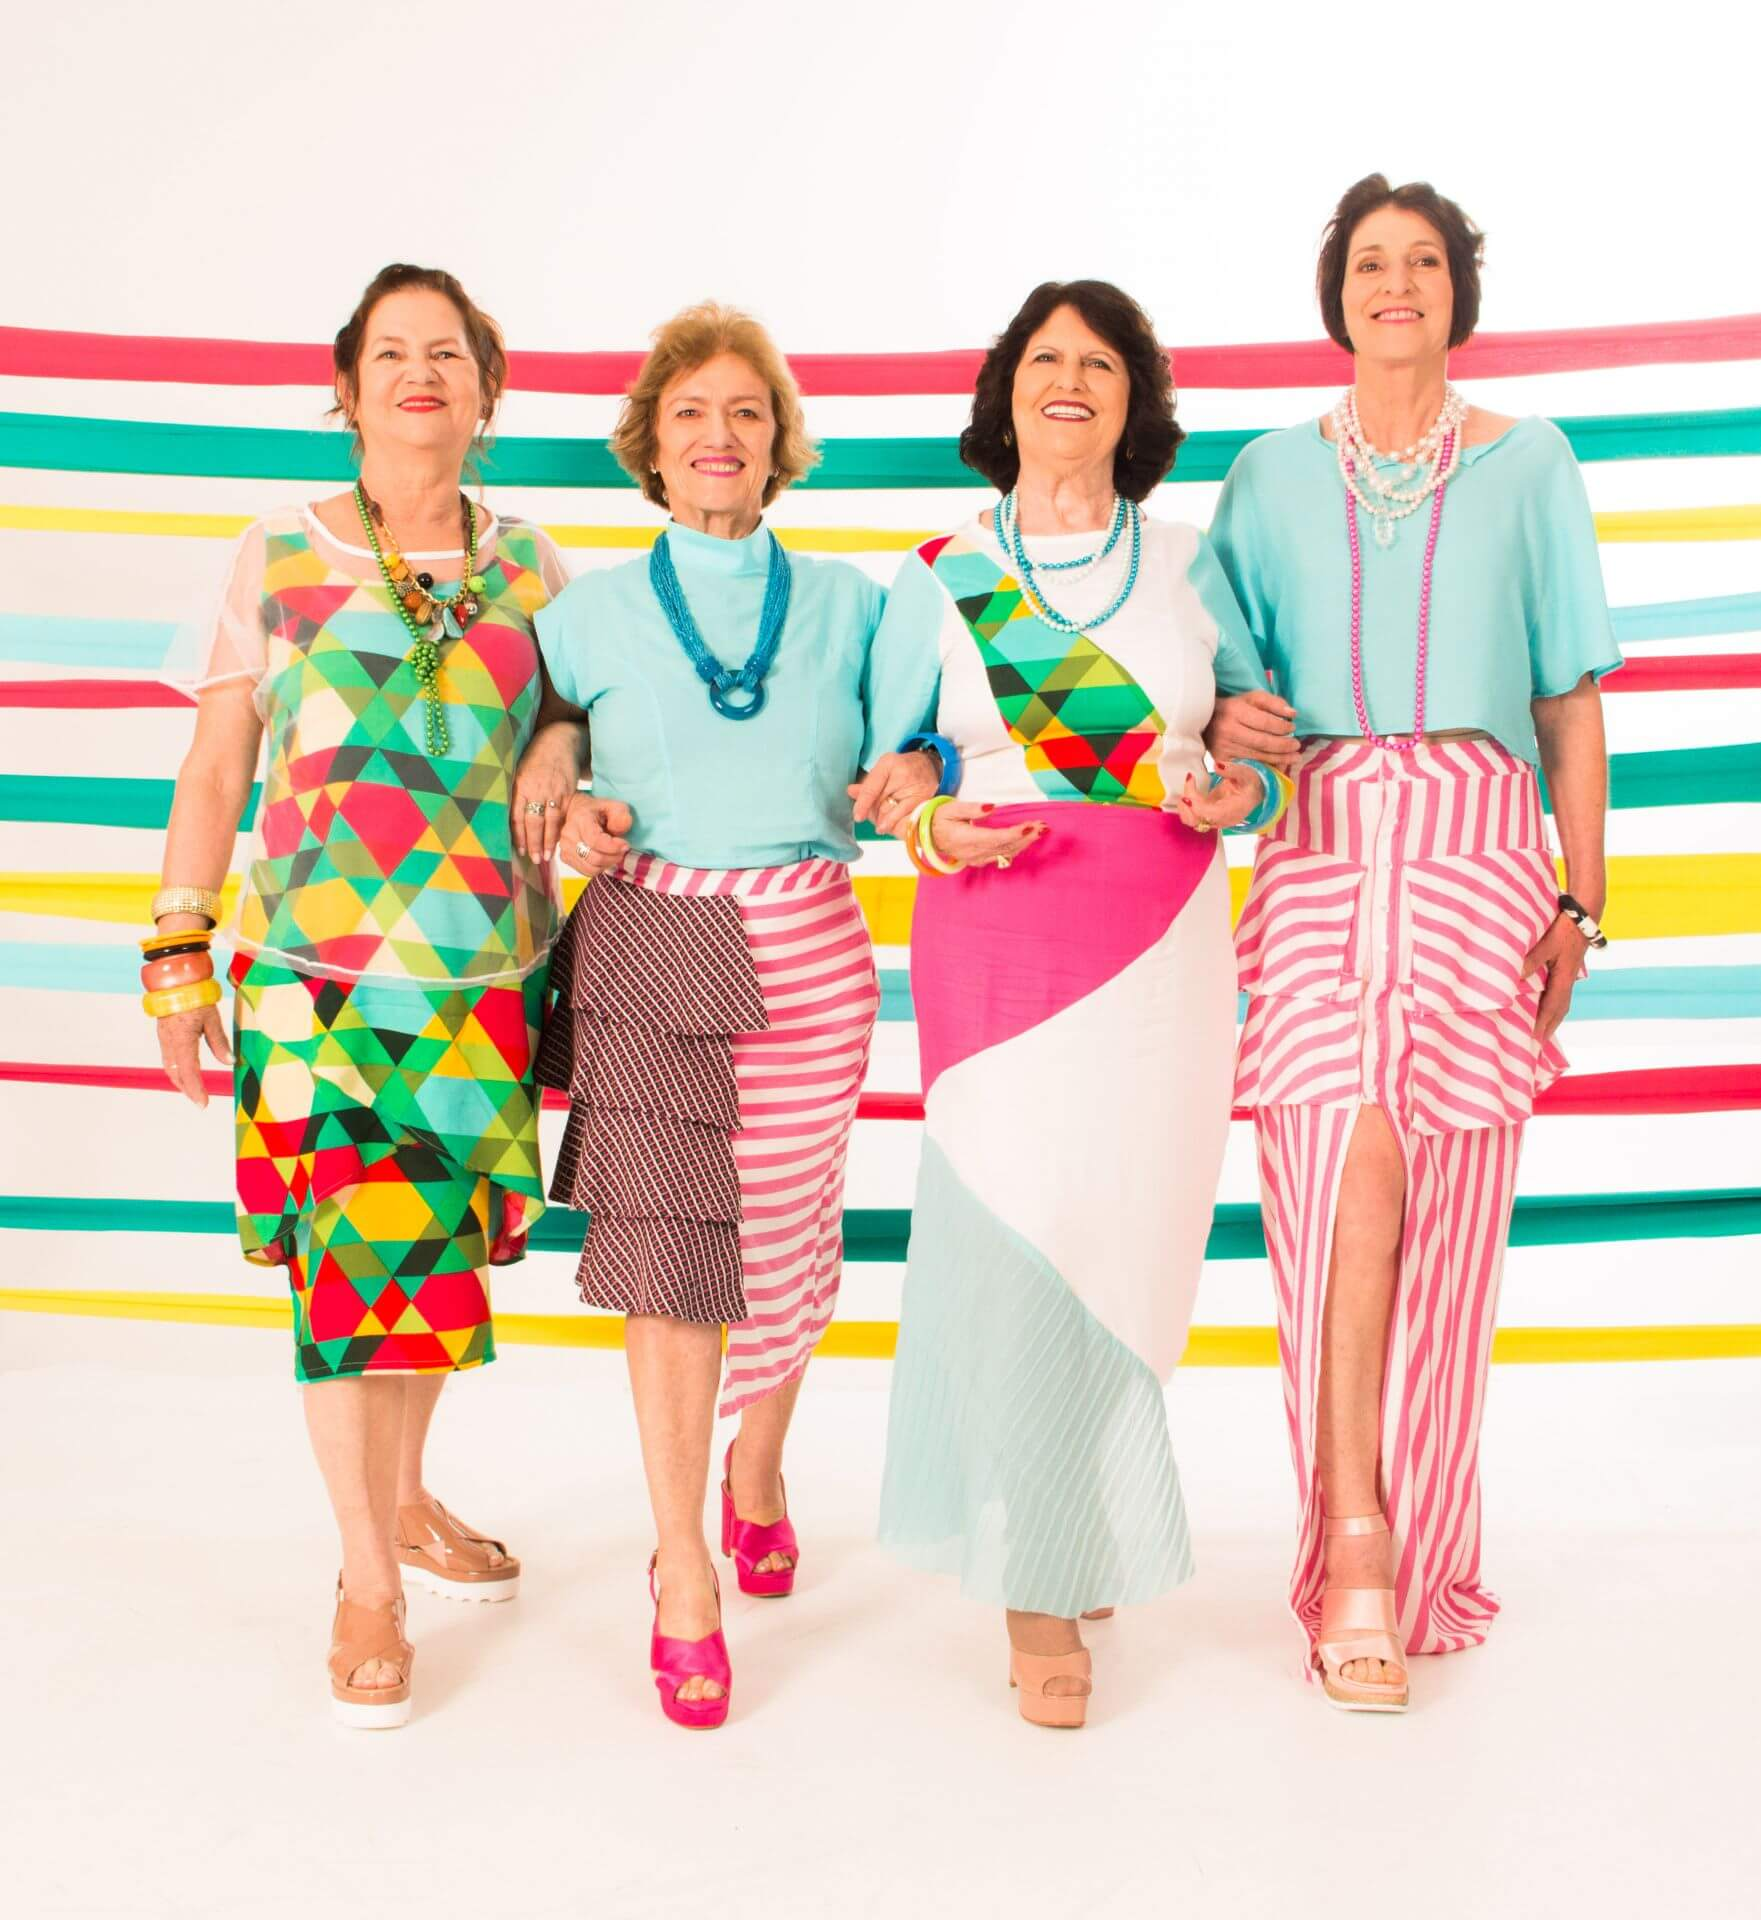 Desfile Fashion Now da UNIFEBE destaca diversidade na passarela